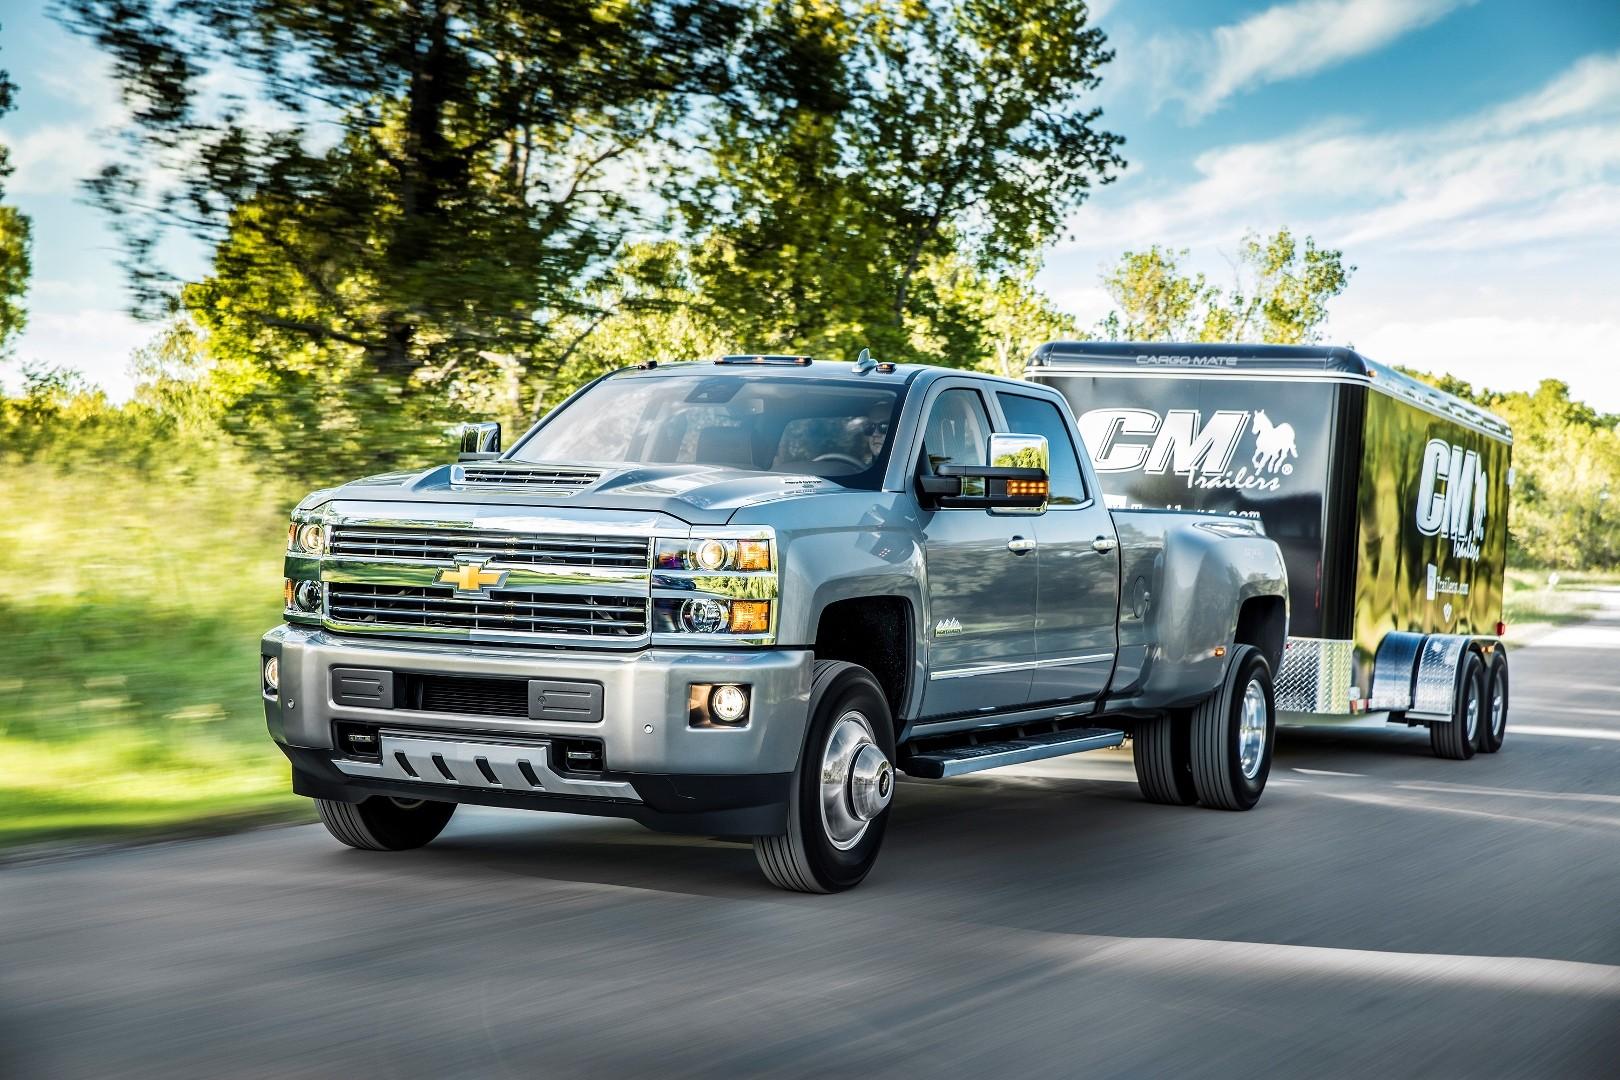 L5P Duramax Diesel Is Go In 2017 Chevrolet Silverado HD ...